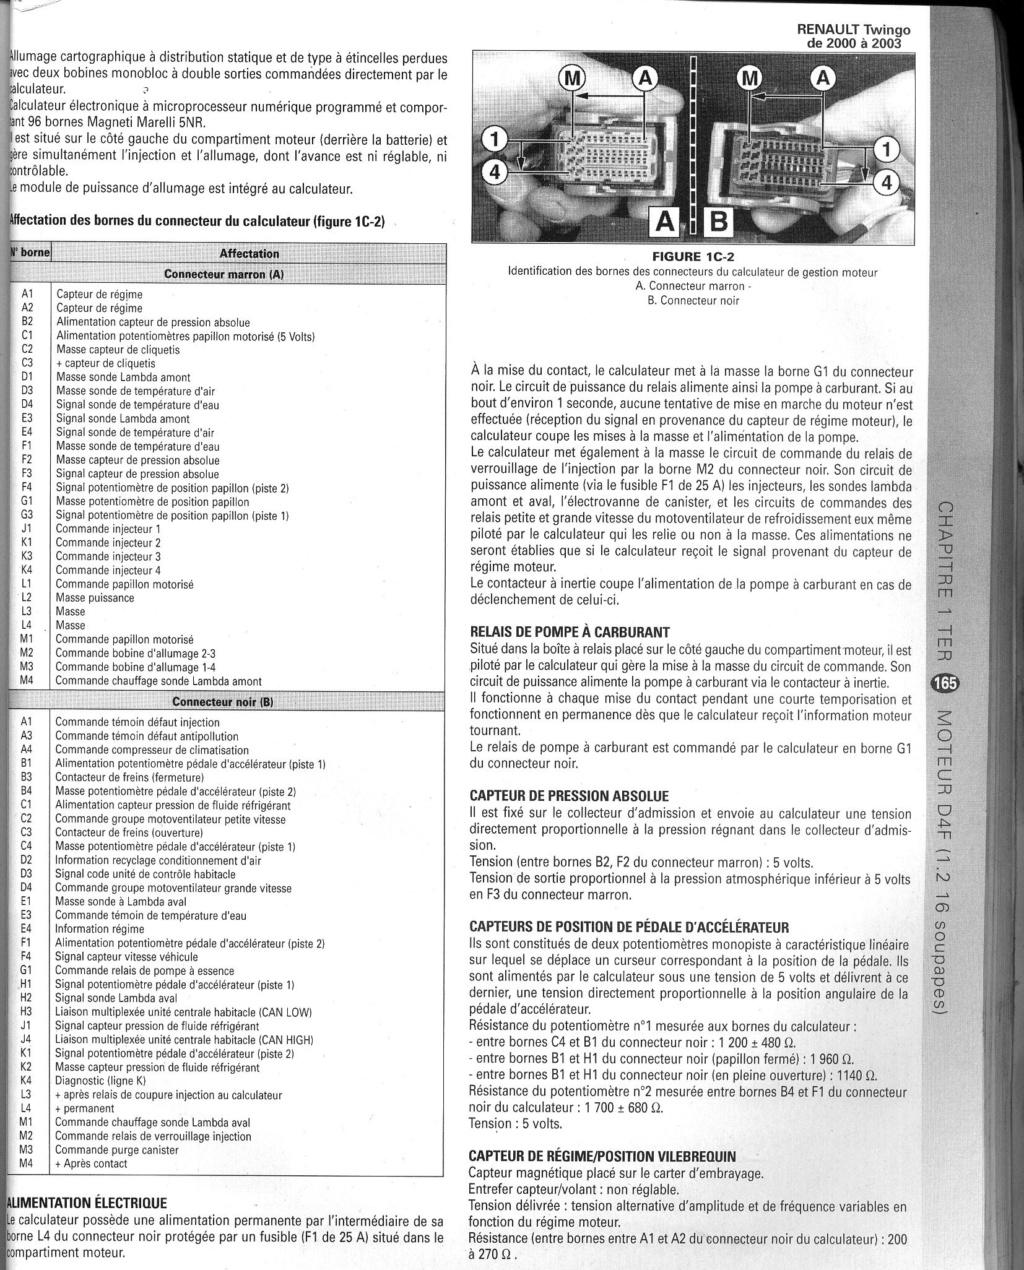 panne bizarre - Page 2 Ago15910